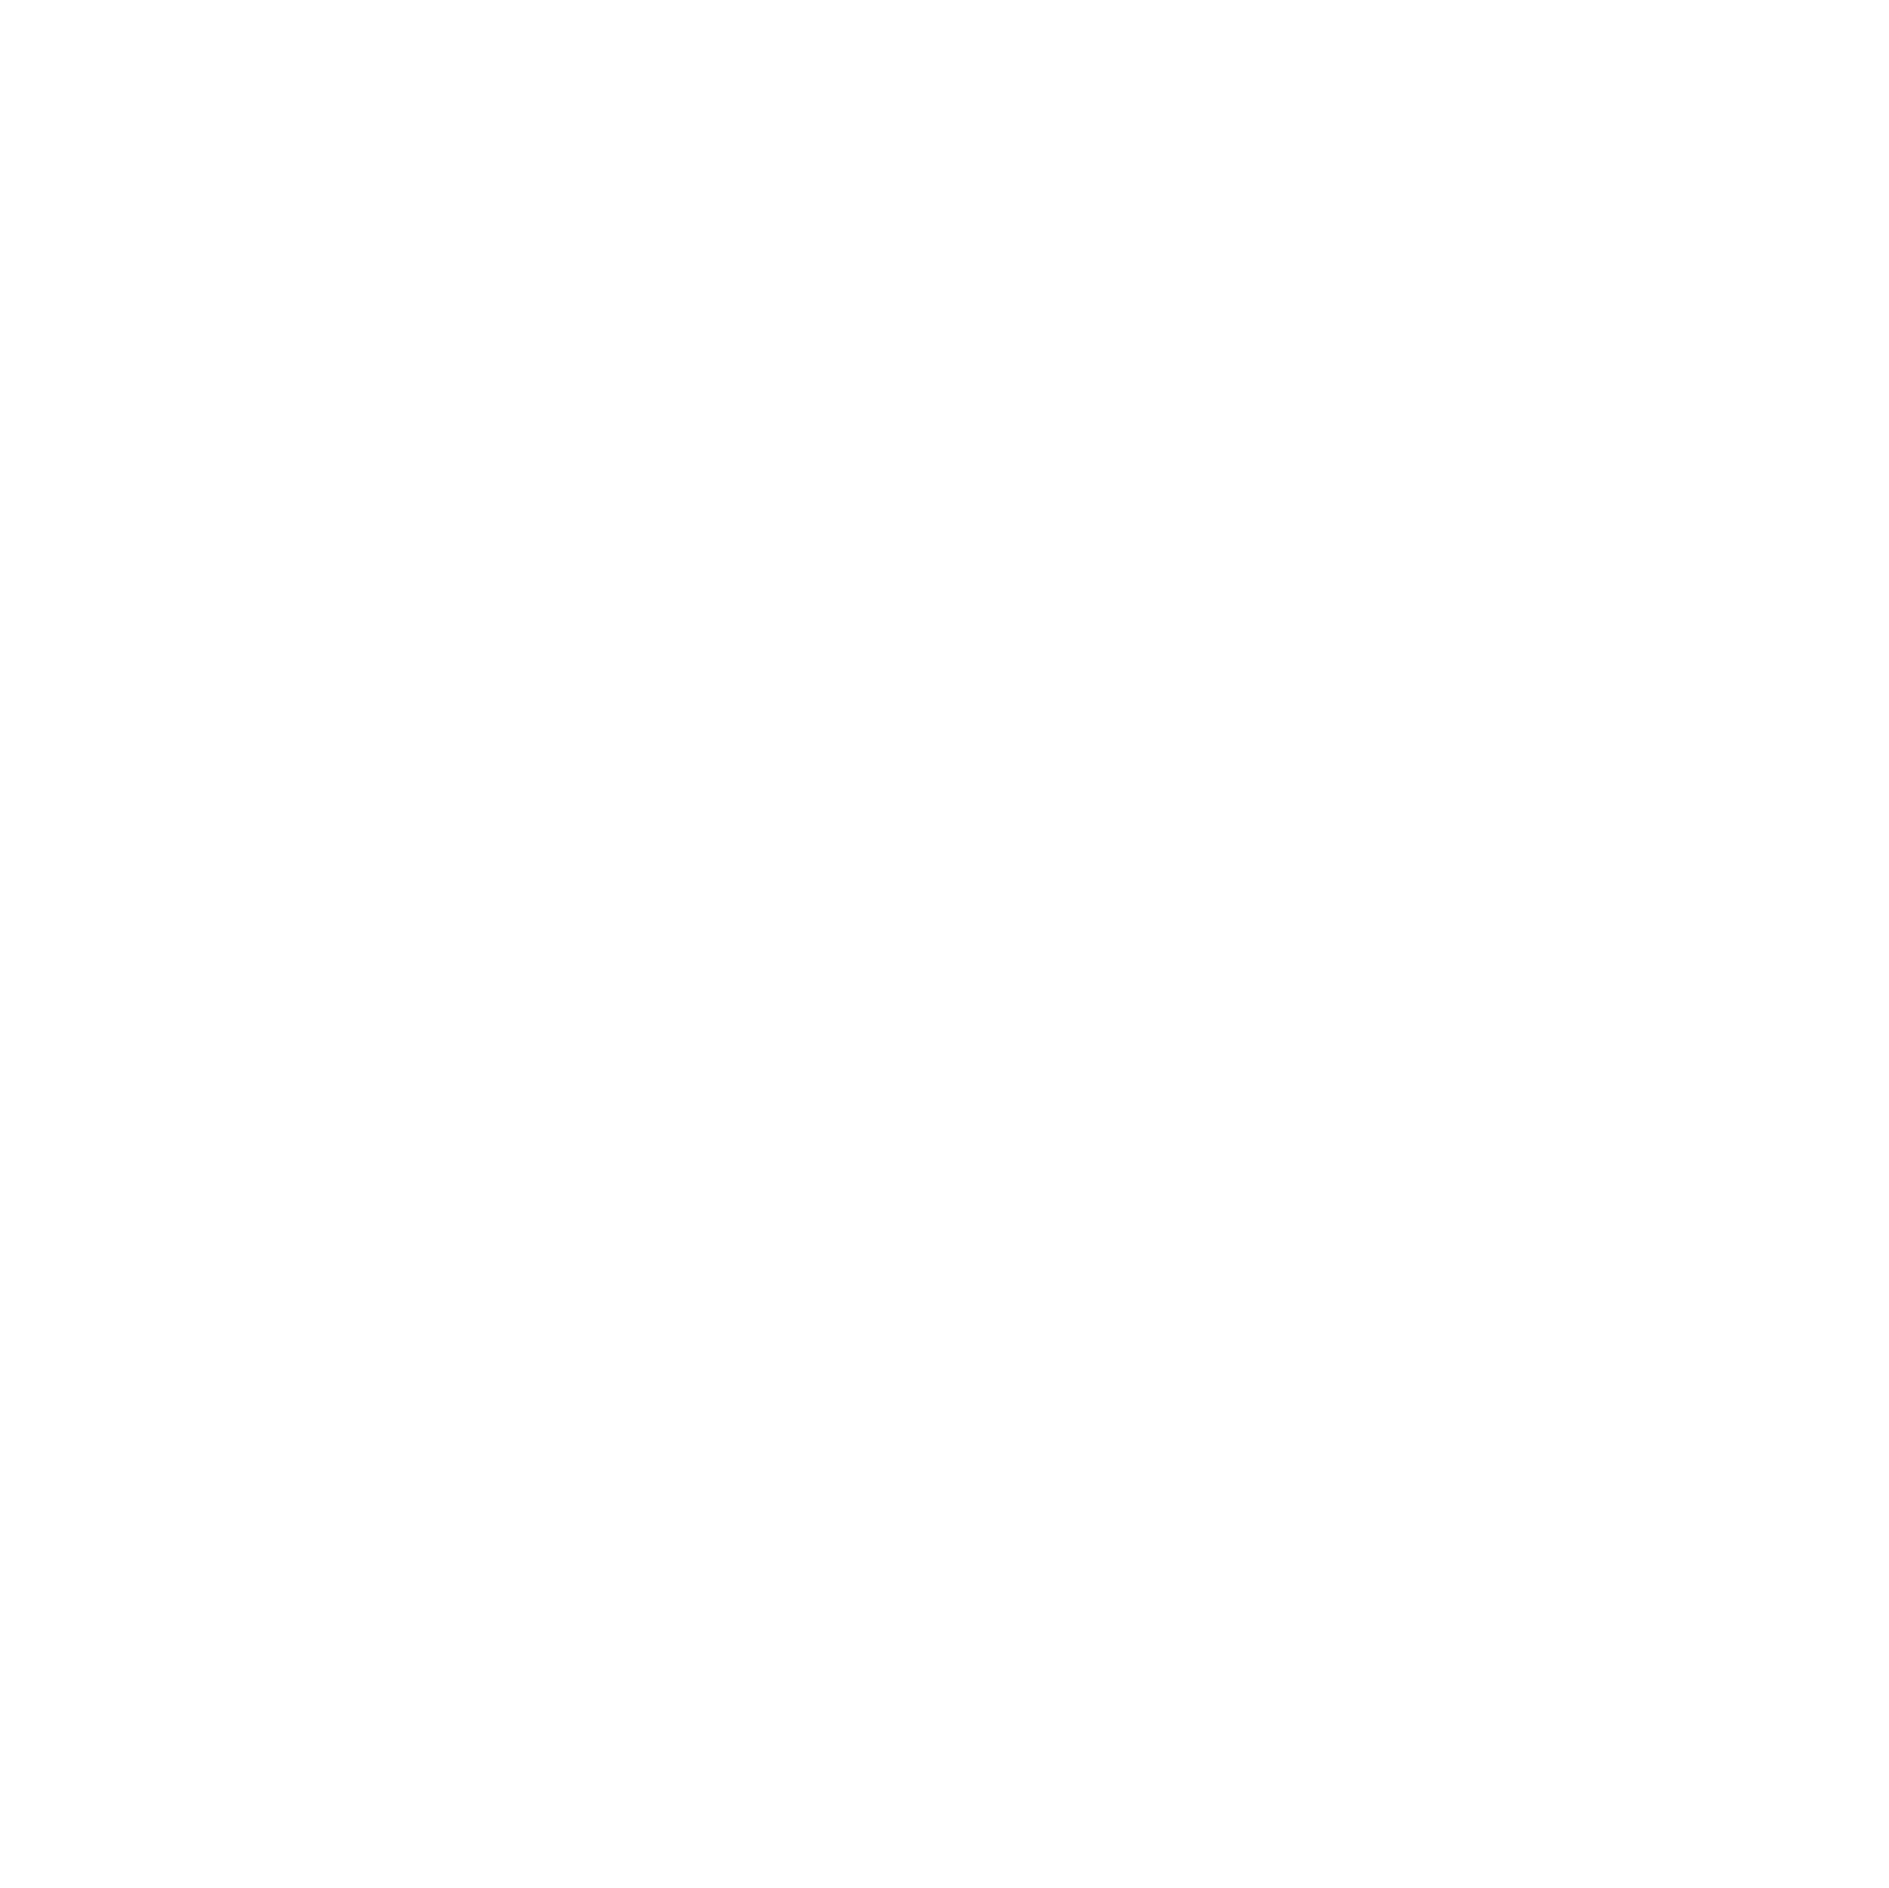 EIA white transparent.png